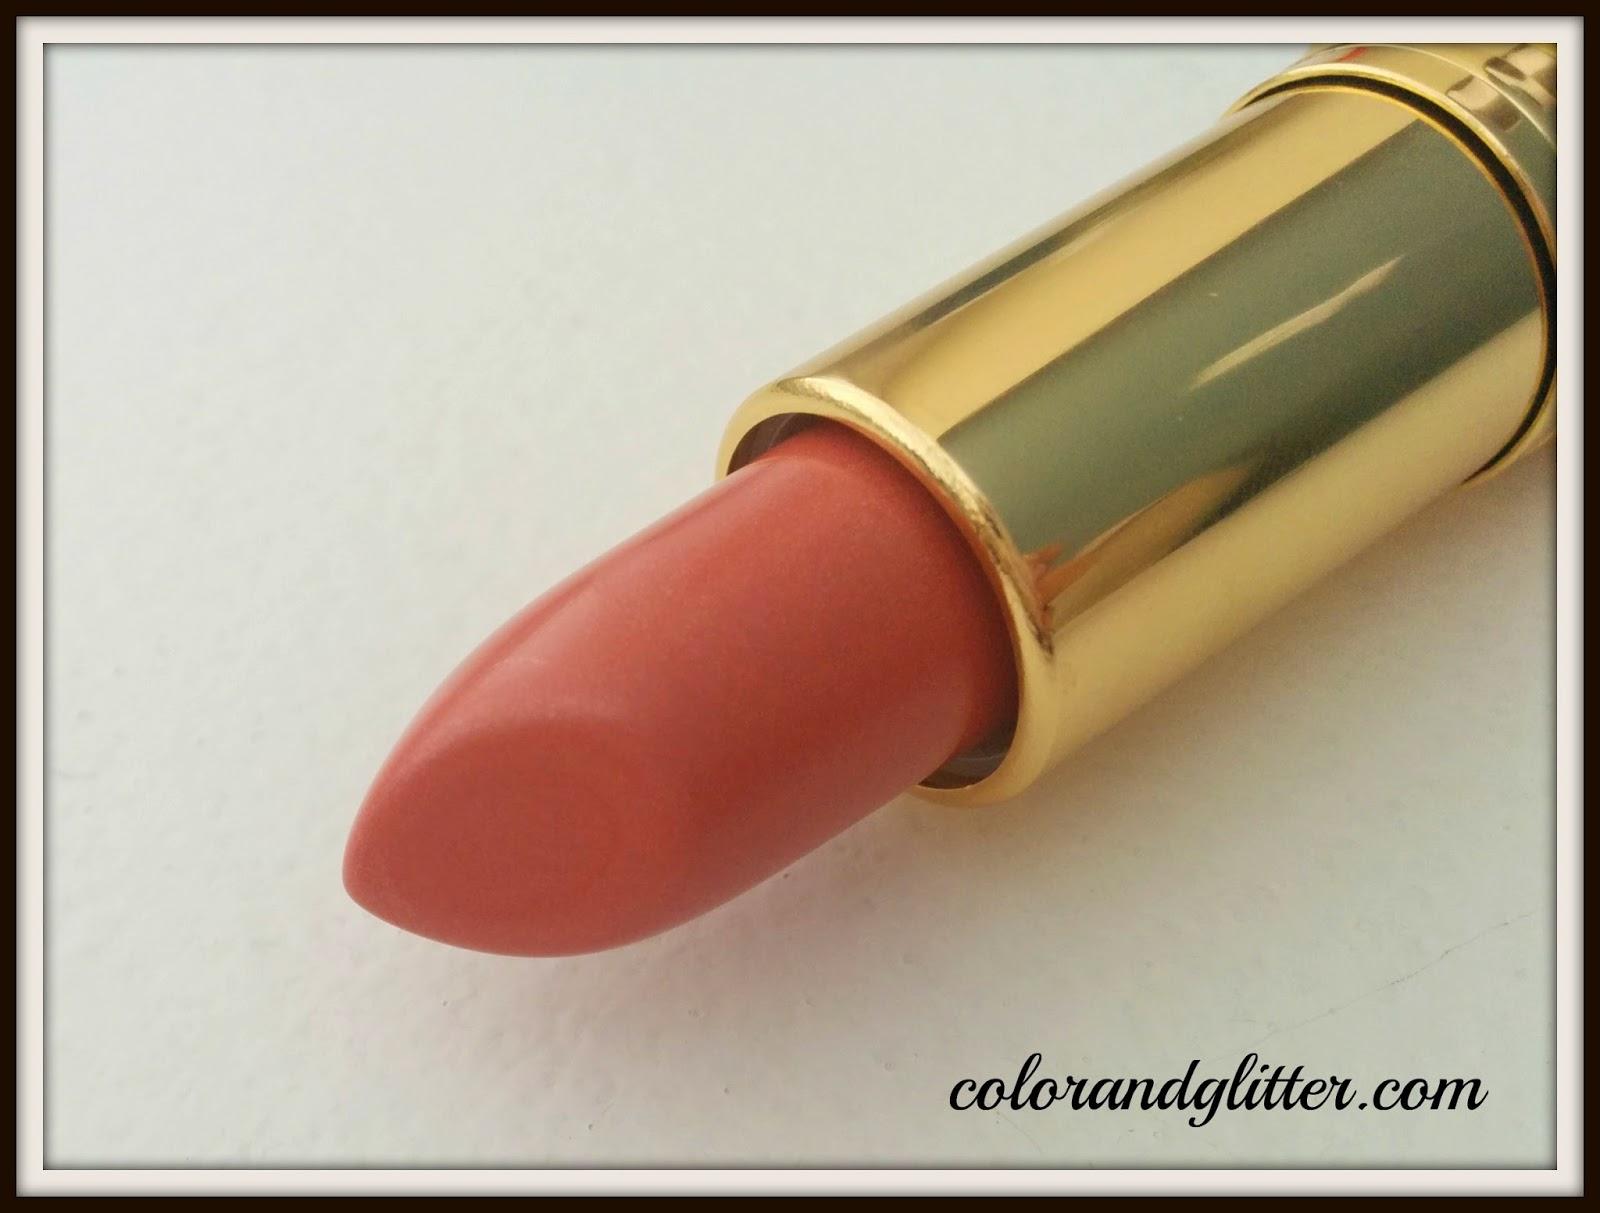 Revlon Super Lustrous Lipstick in Demure